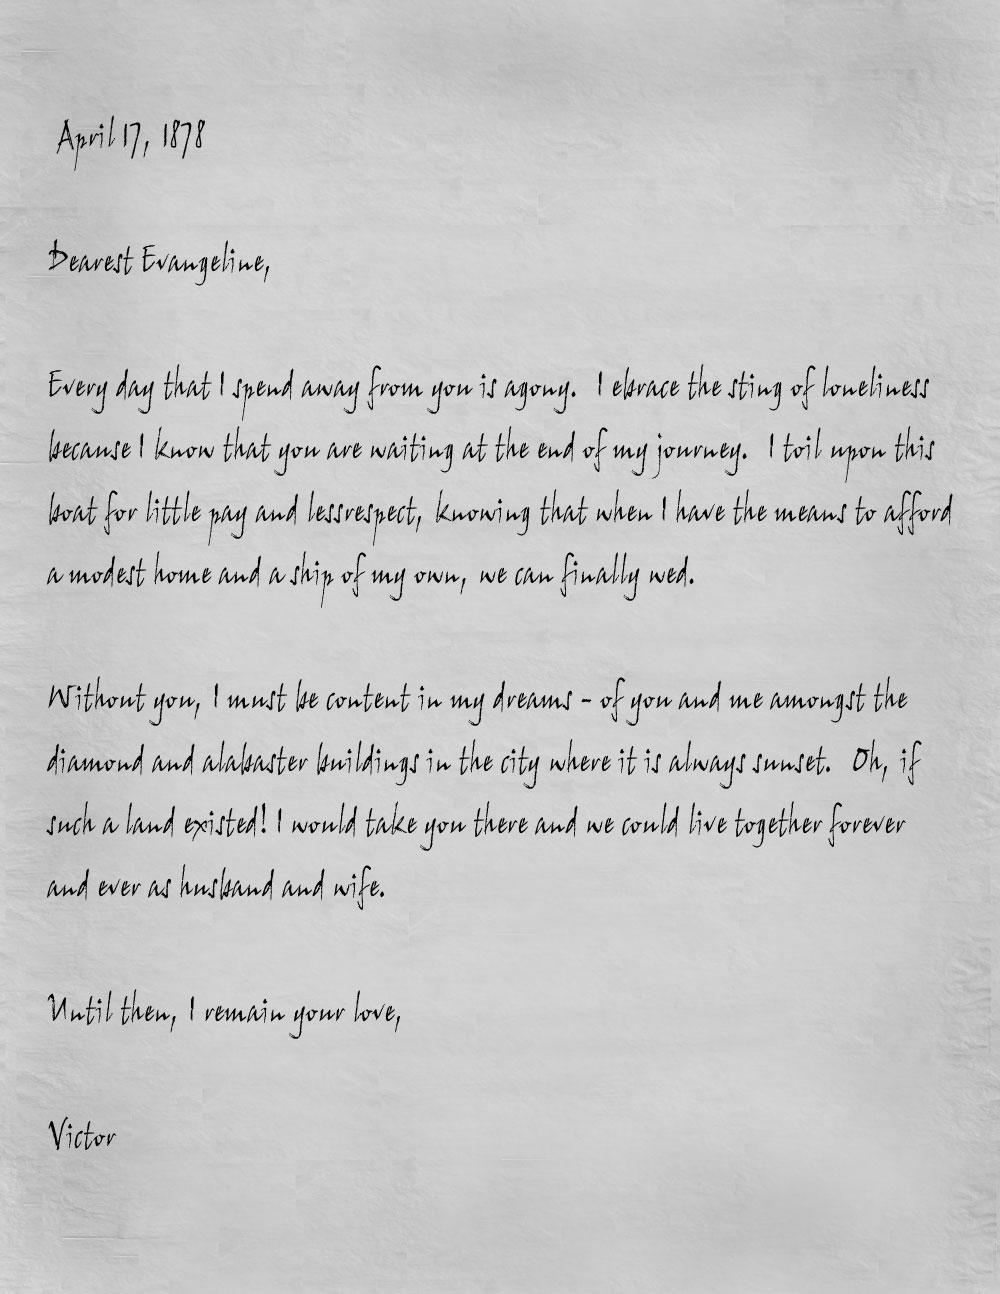 Vittorio letter english